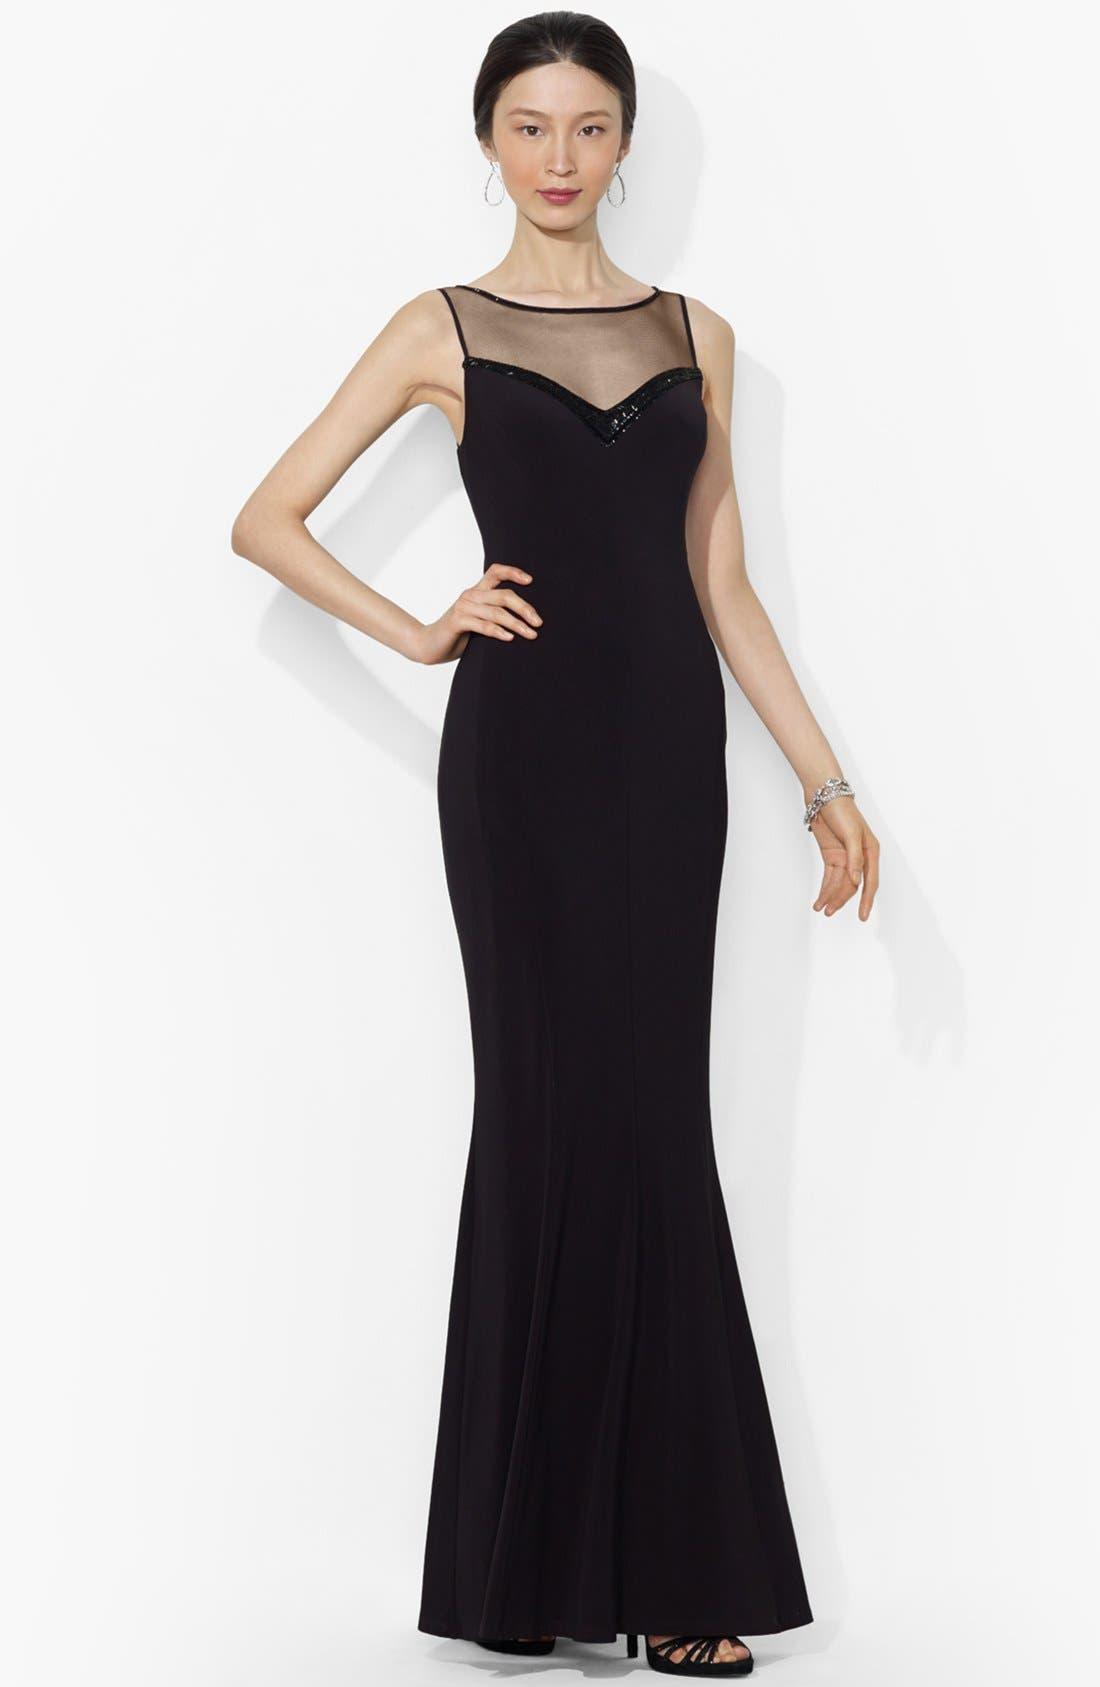 Main Image - Lauren Ralph Lauren Embellished Yoke Mermaid Gown (Regular & Petite)